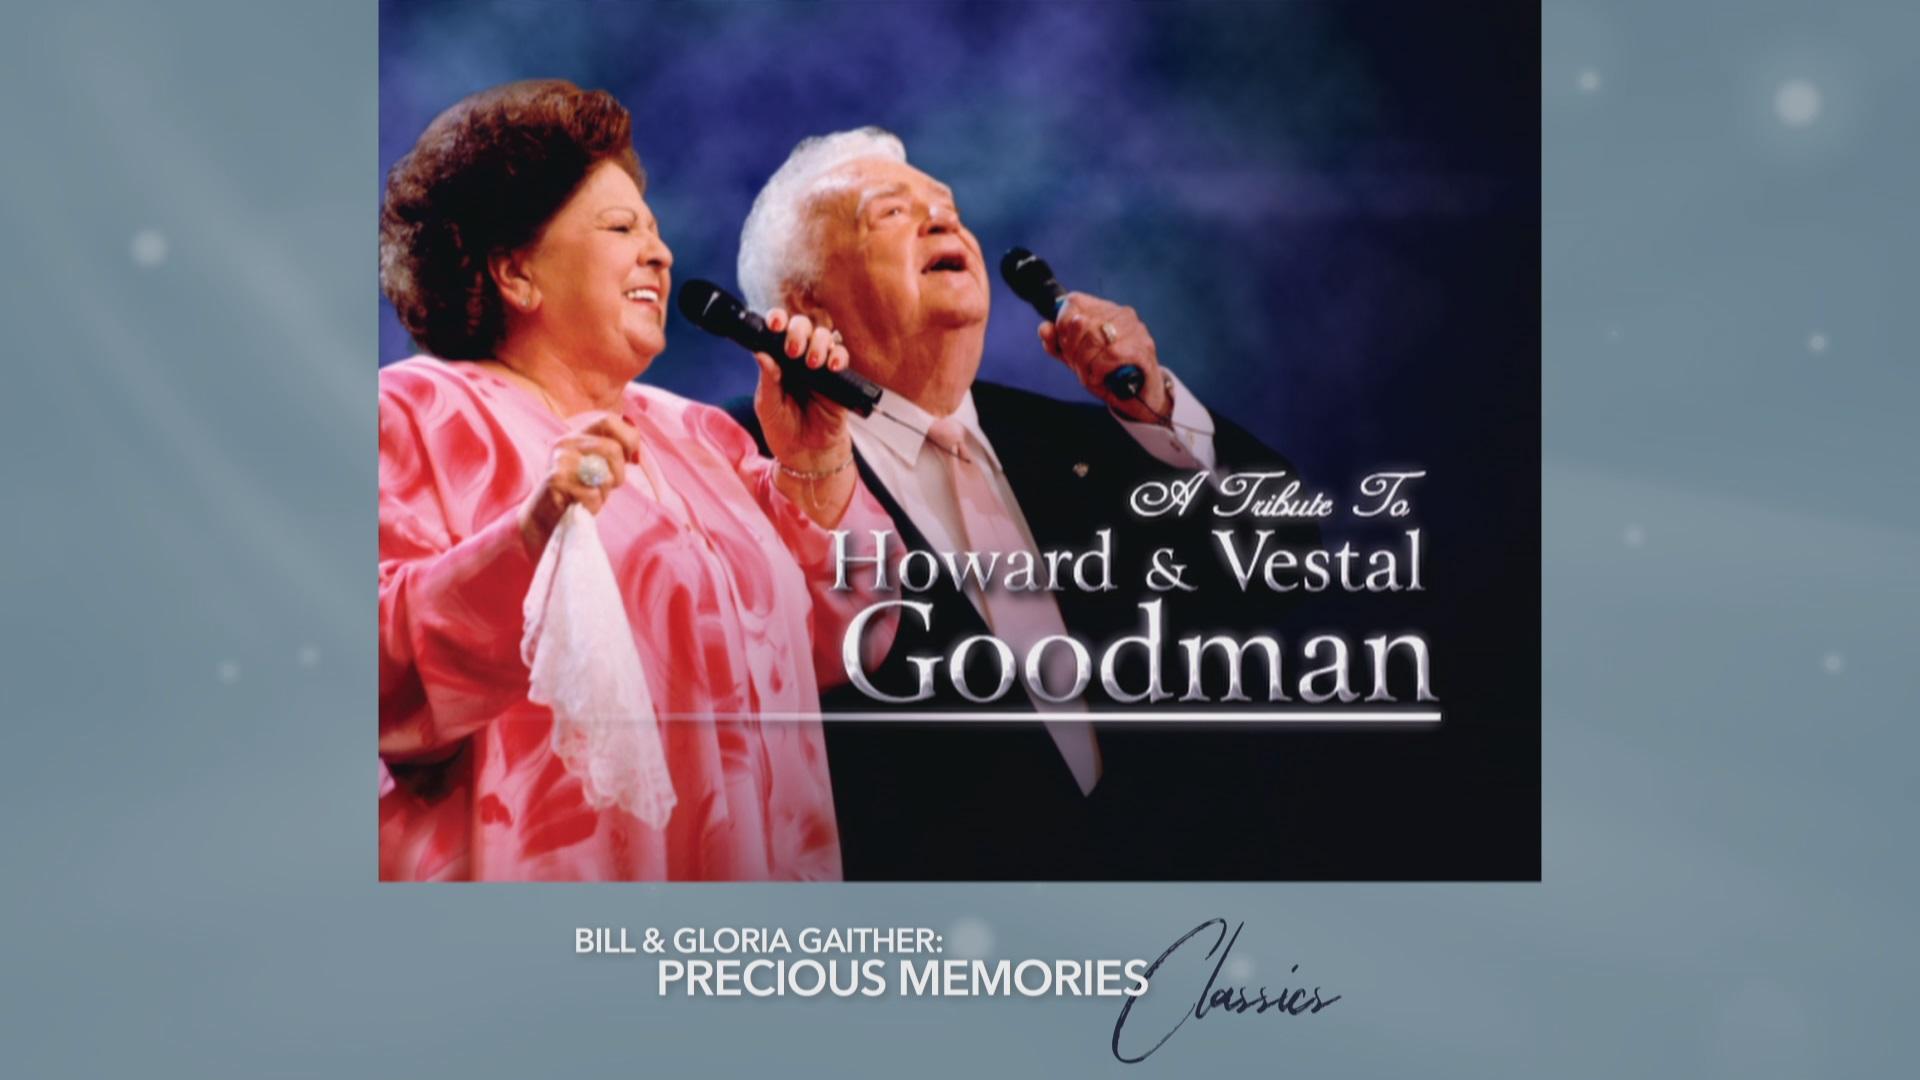 Tribute To Howard and Vestal Goodman